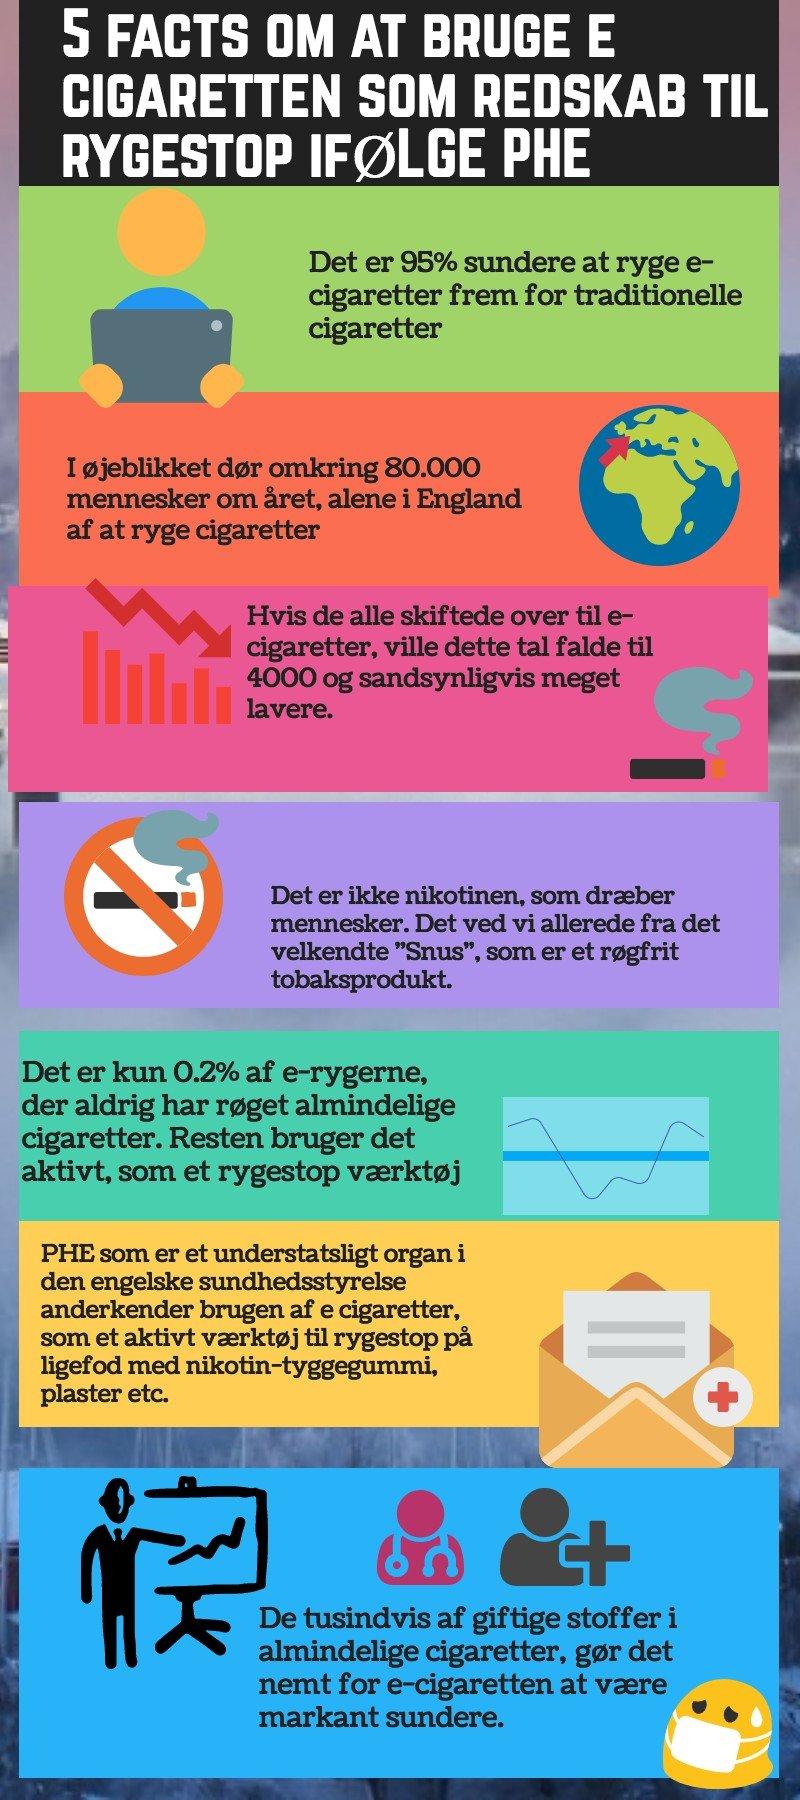 rygestop bivirkninger fordele rygestop uden nikotin abstinenser infografik